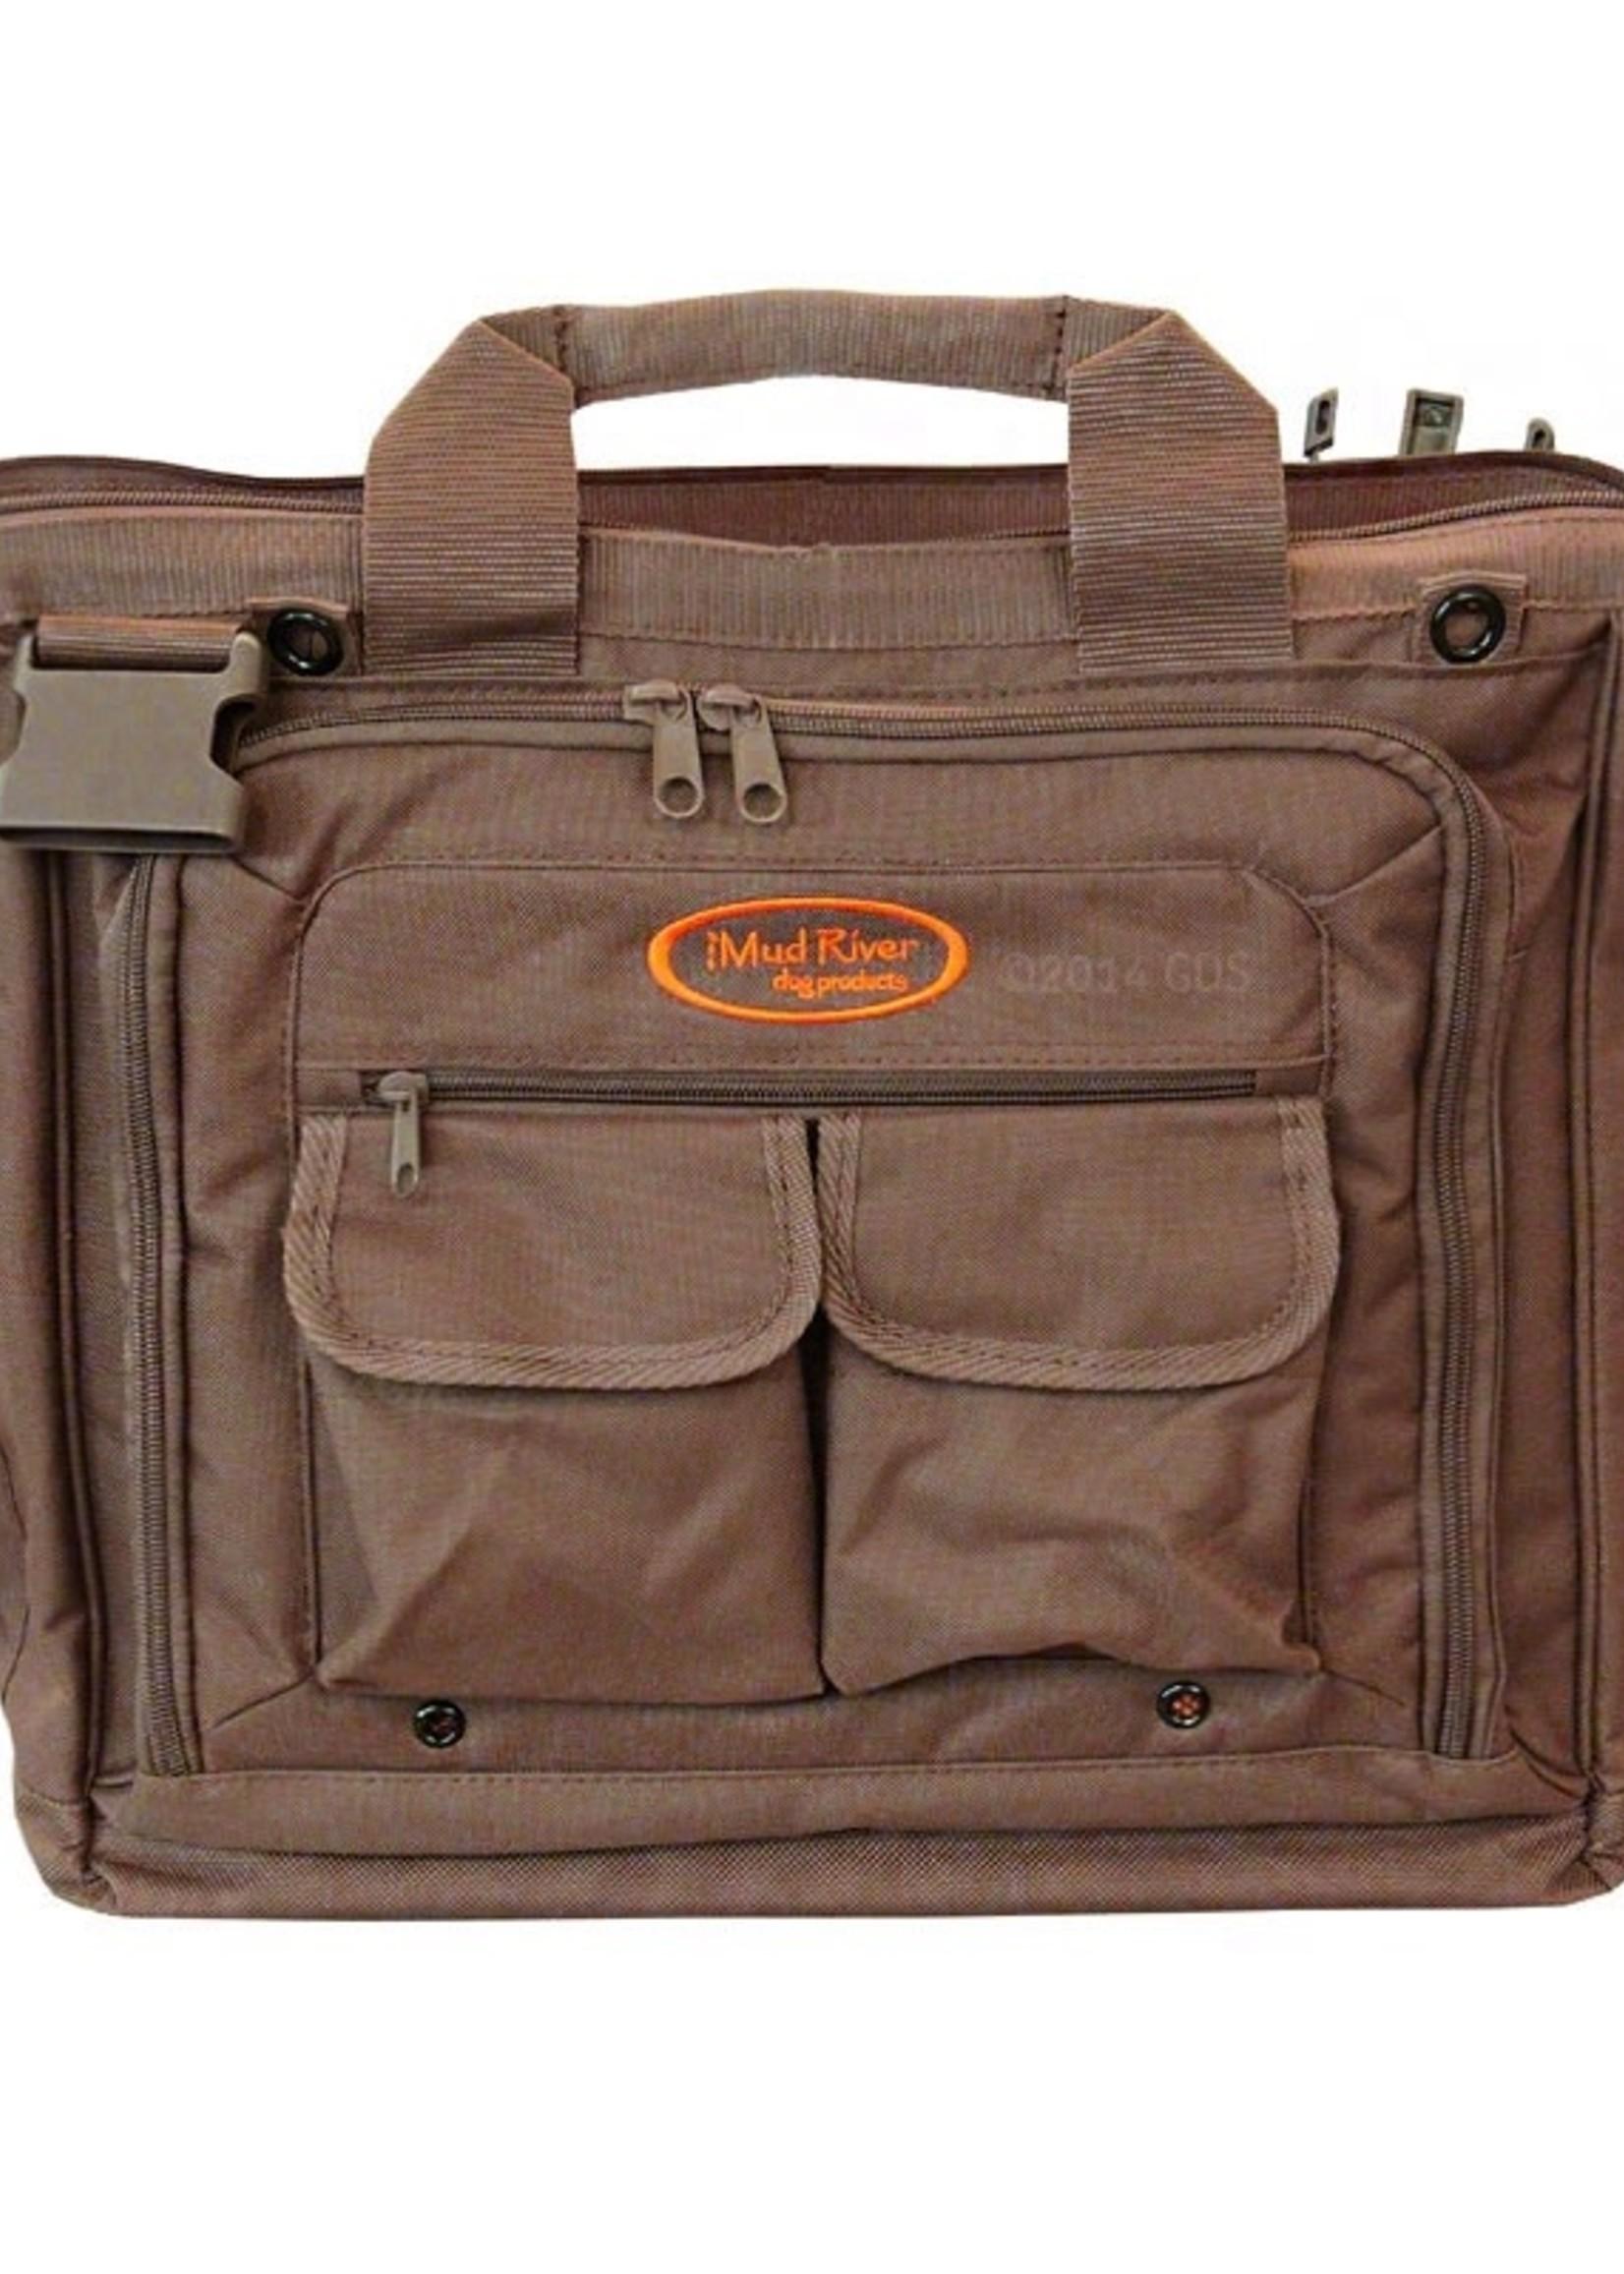 BOYT HARNESS COMPANY Mud River - The Handlers Bag - Brown